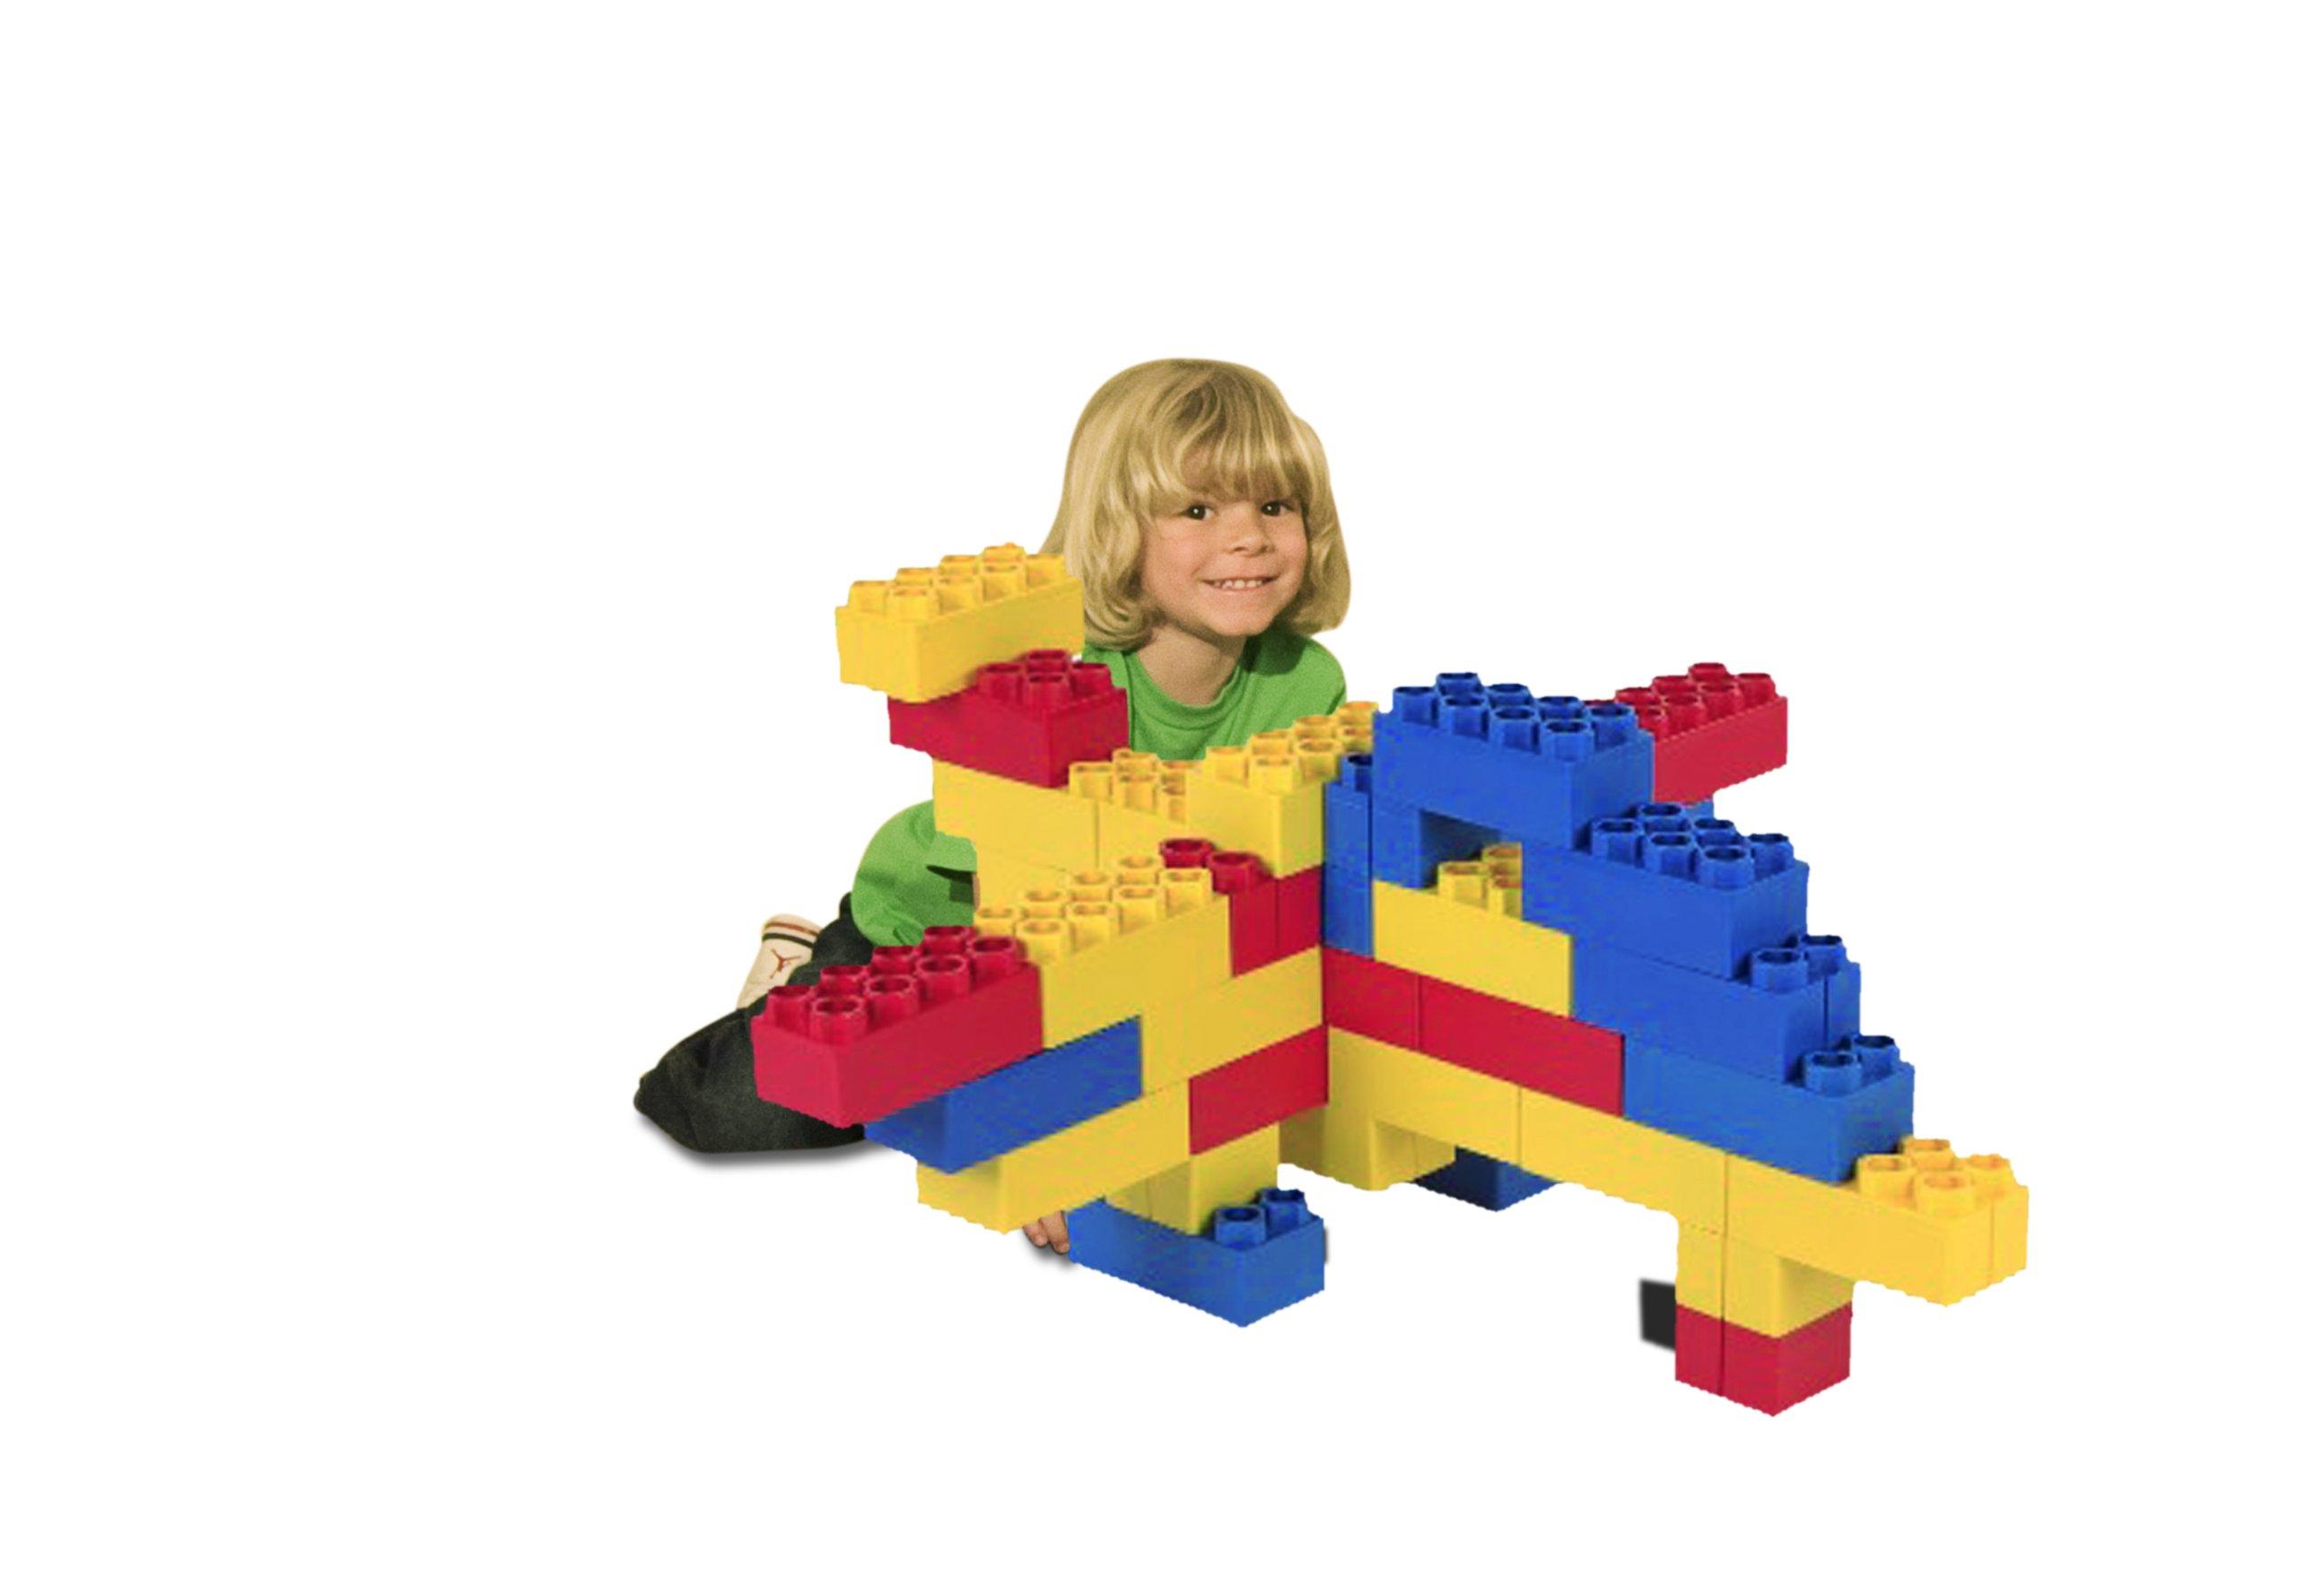 48pc Jumbo Blocks - Learner Set (Made in the USA)